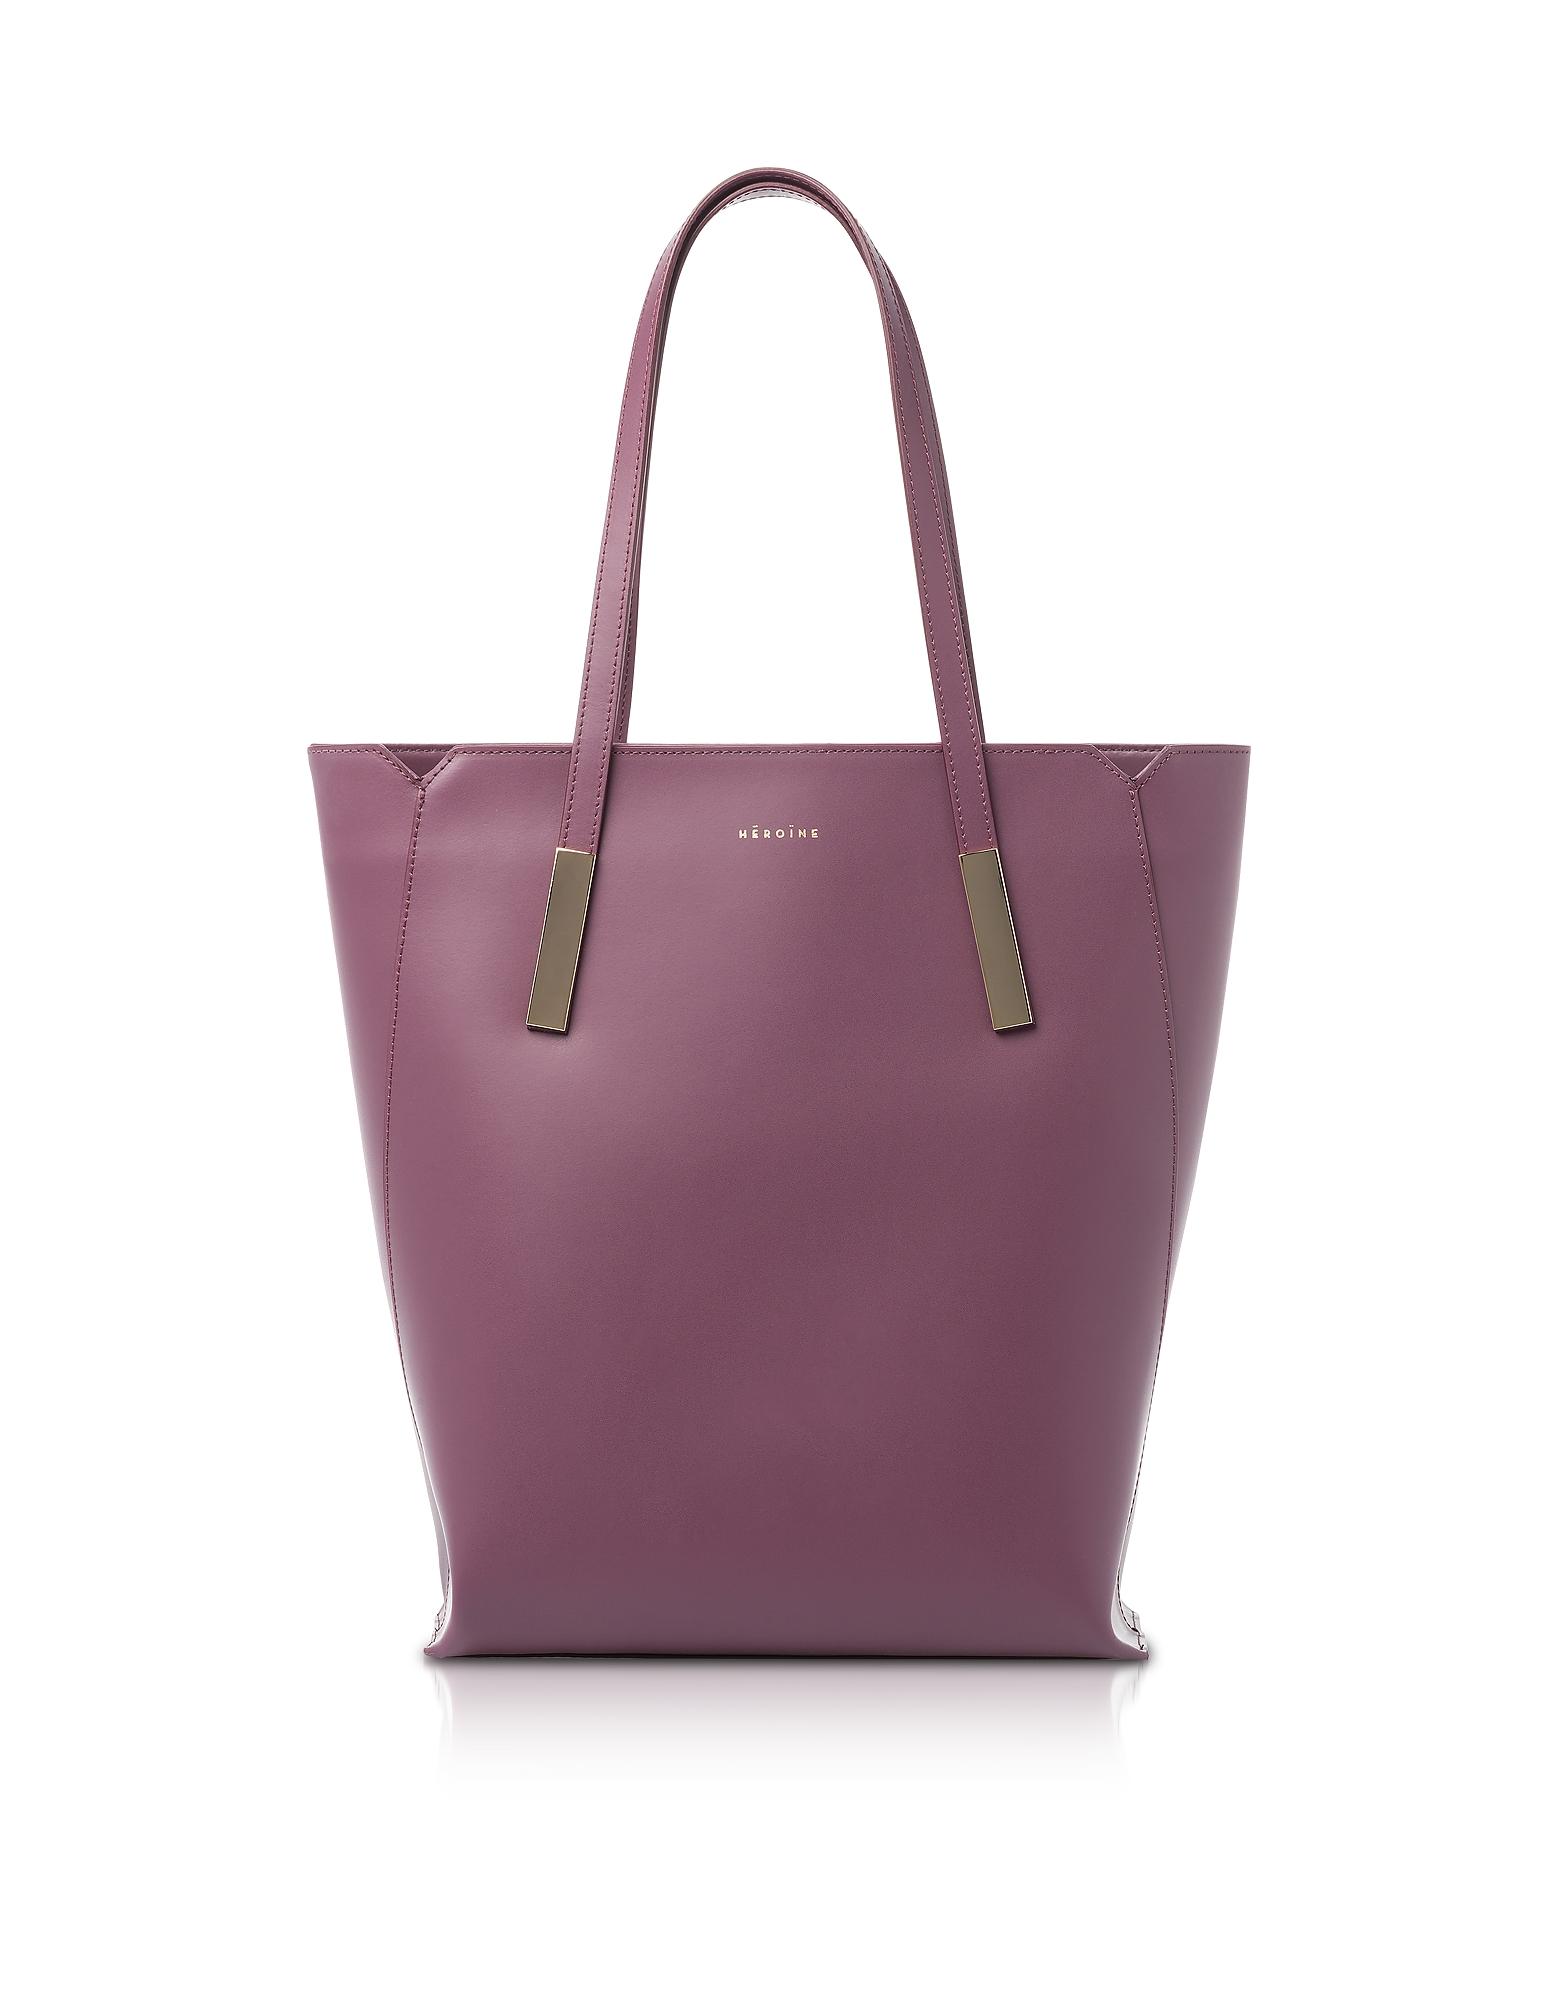 Maison Heroine Designer Handbags, Berry Marta Leather Tote Bag